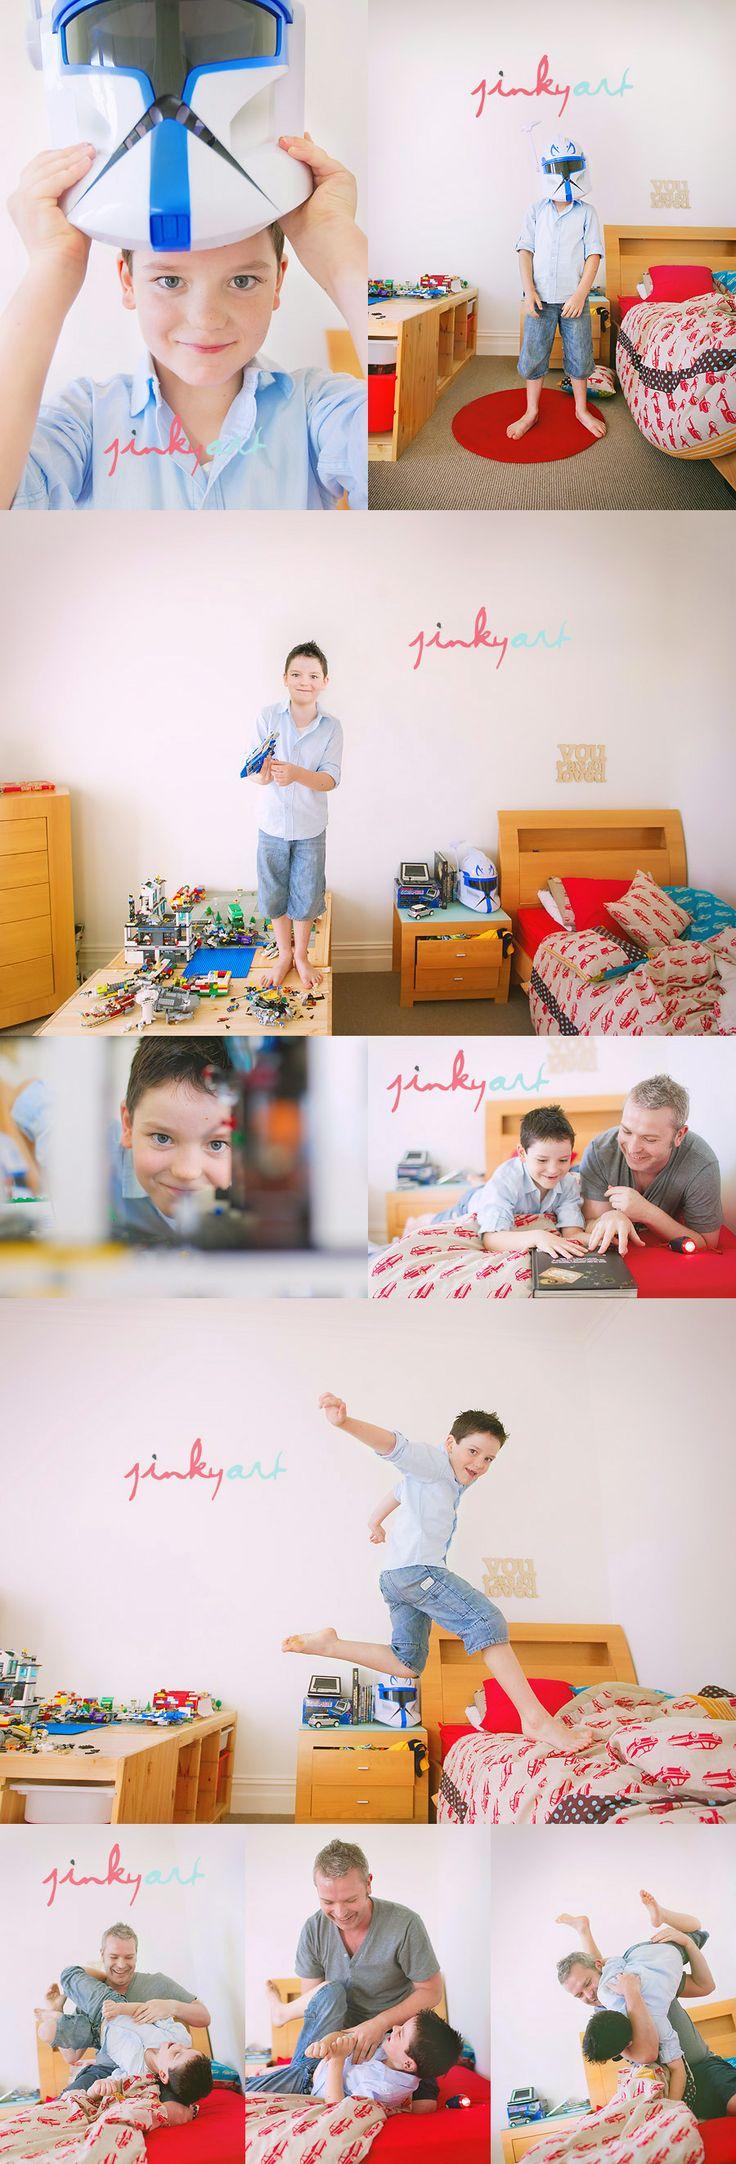 Lifestyle: Photo Ideas Oth, Lifestyle Families, Lifestyle Shooting, Lifestyle Photography, Children Photography, Photo Shooting, Photography Inspiration, Kids Jinkyart, Photography Kids